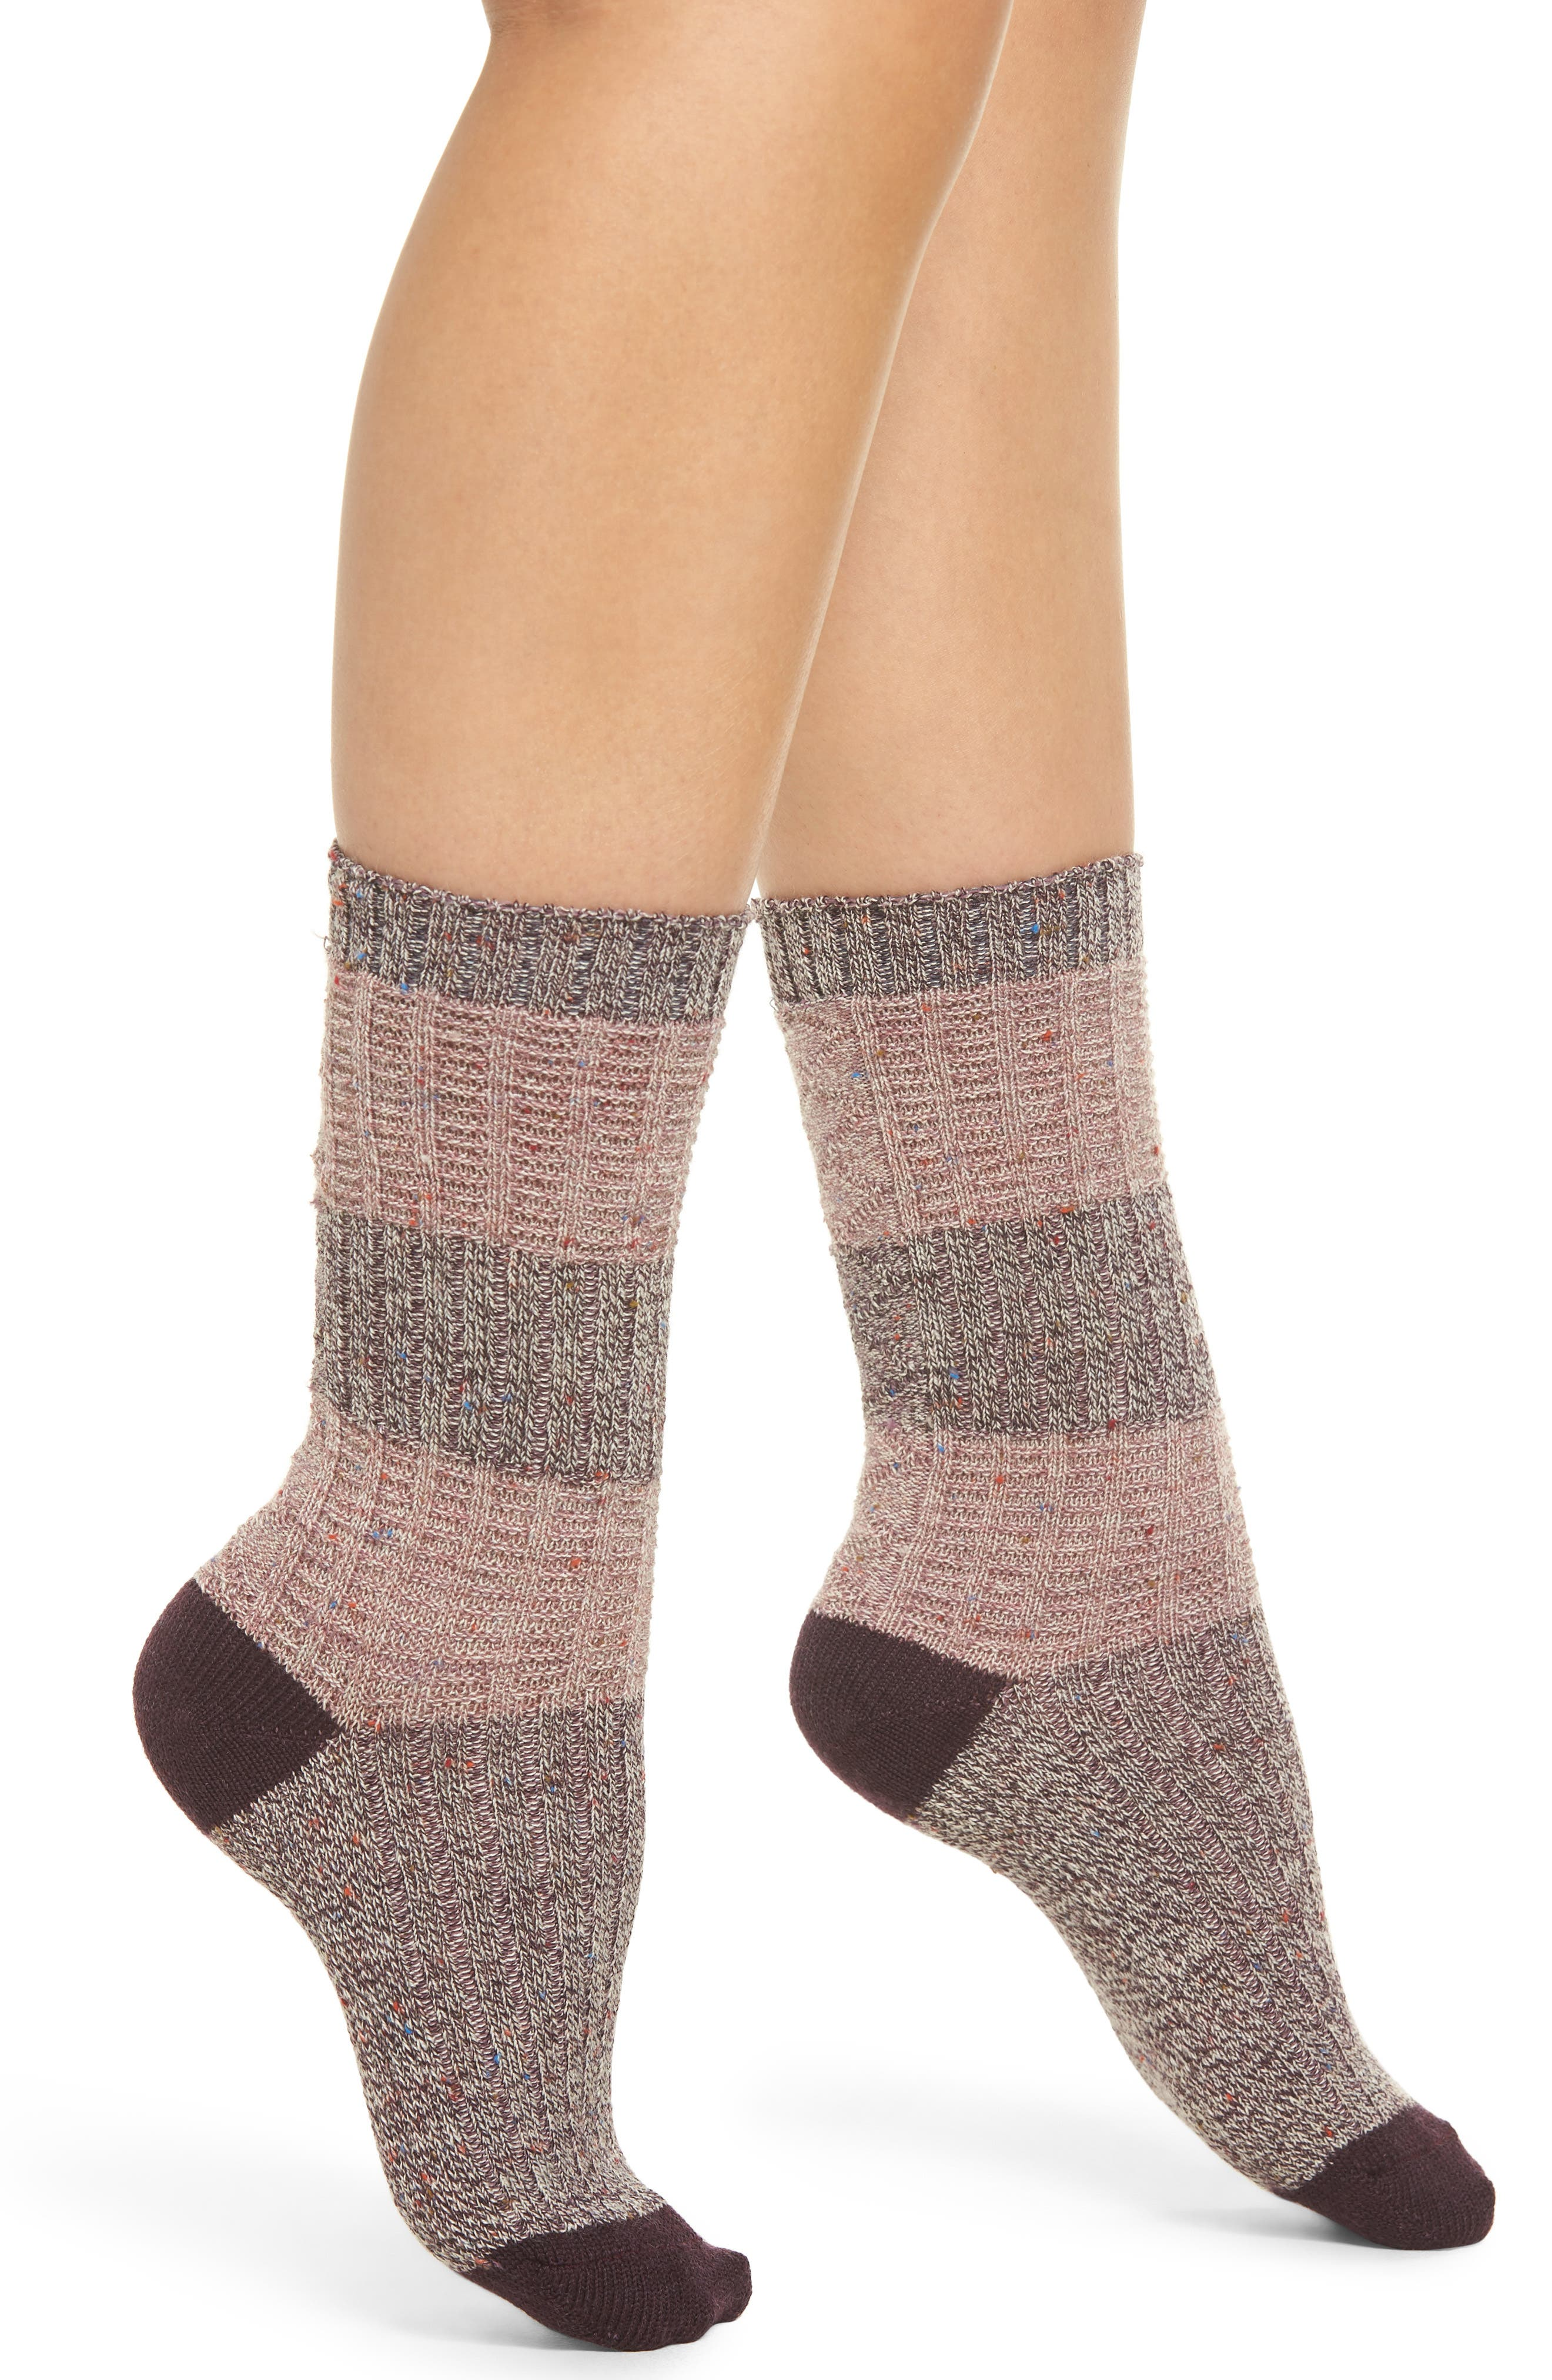 SMARTWOOL, Diamond Bella Premium Crew Socks, Main thumbnail 1, color, BORDEAUX HEATHER